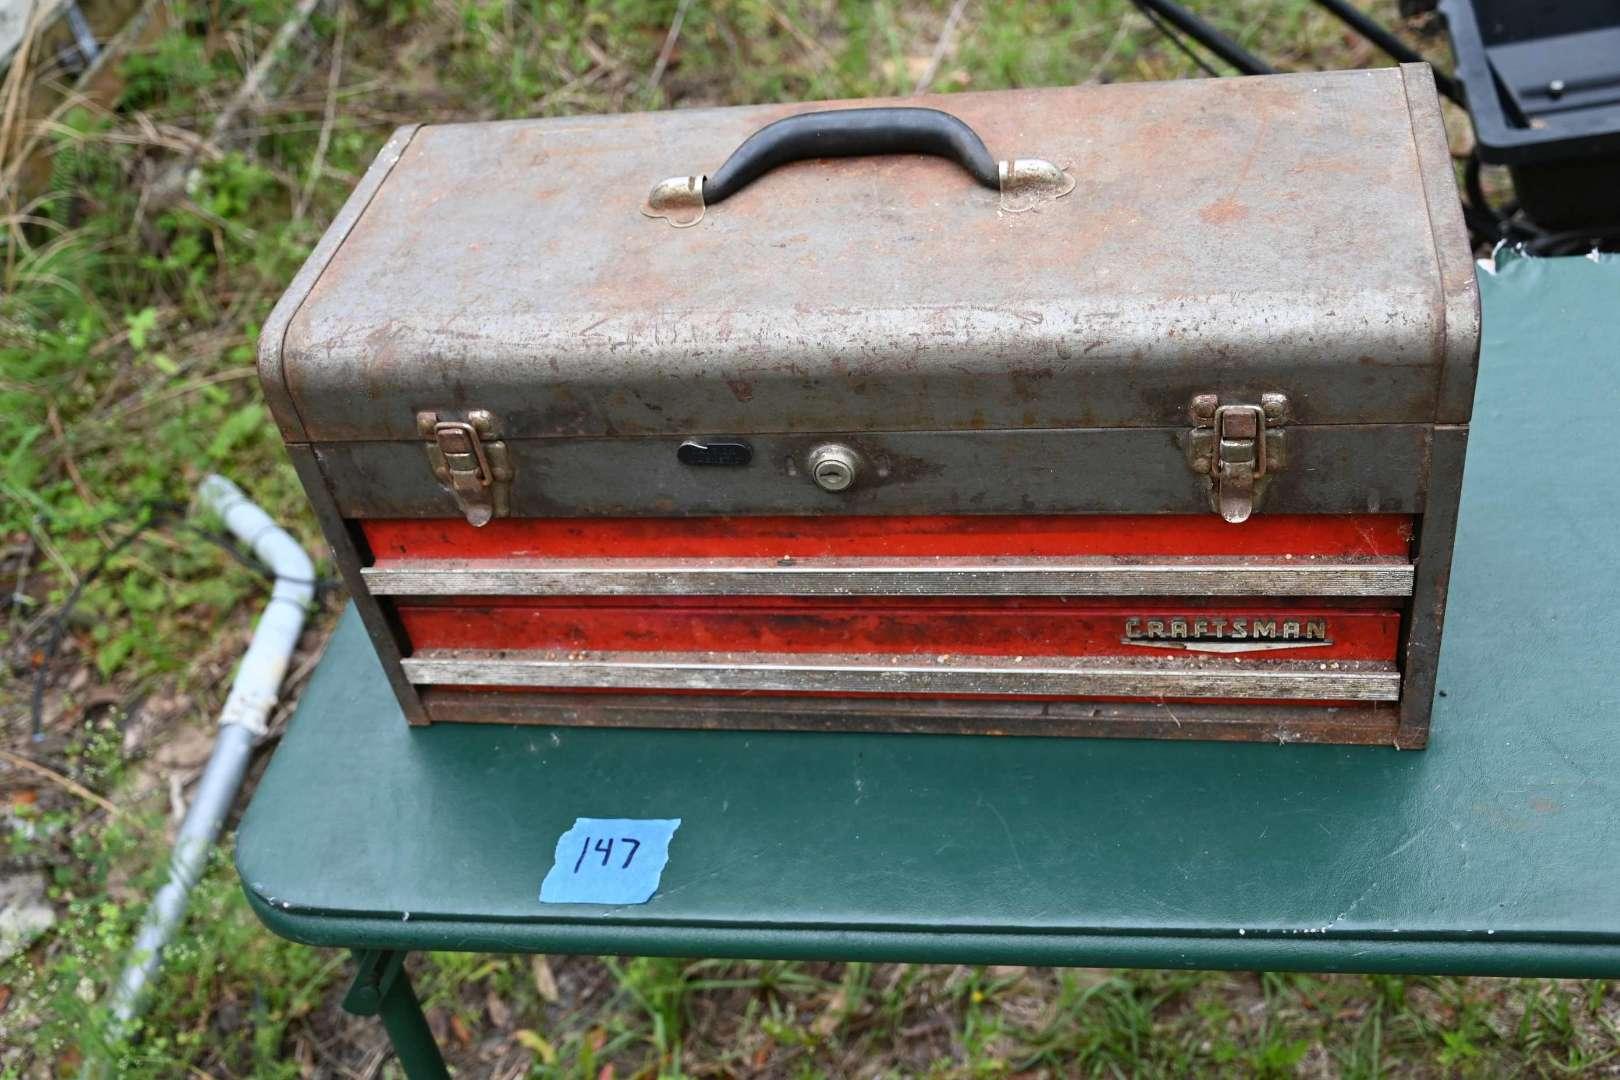 Lot # 147 Vintage CRAFTSMAN two drawer locking tool box with tray